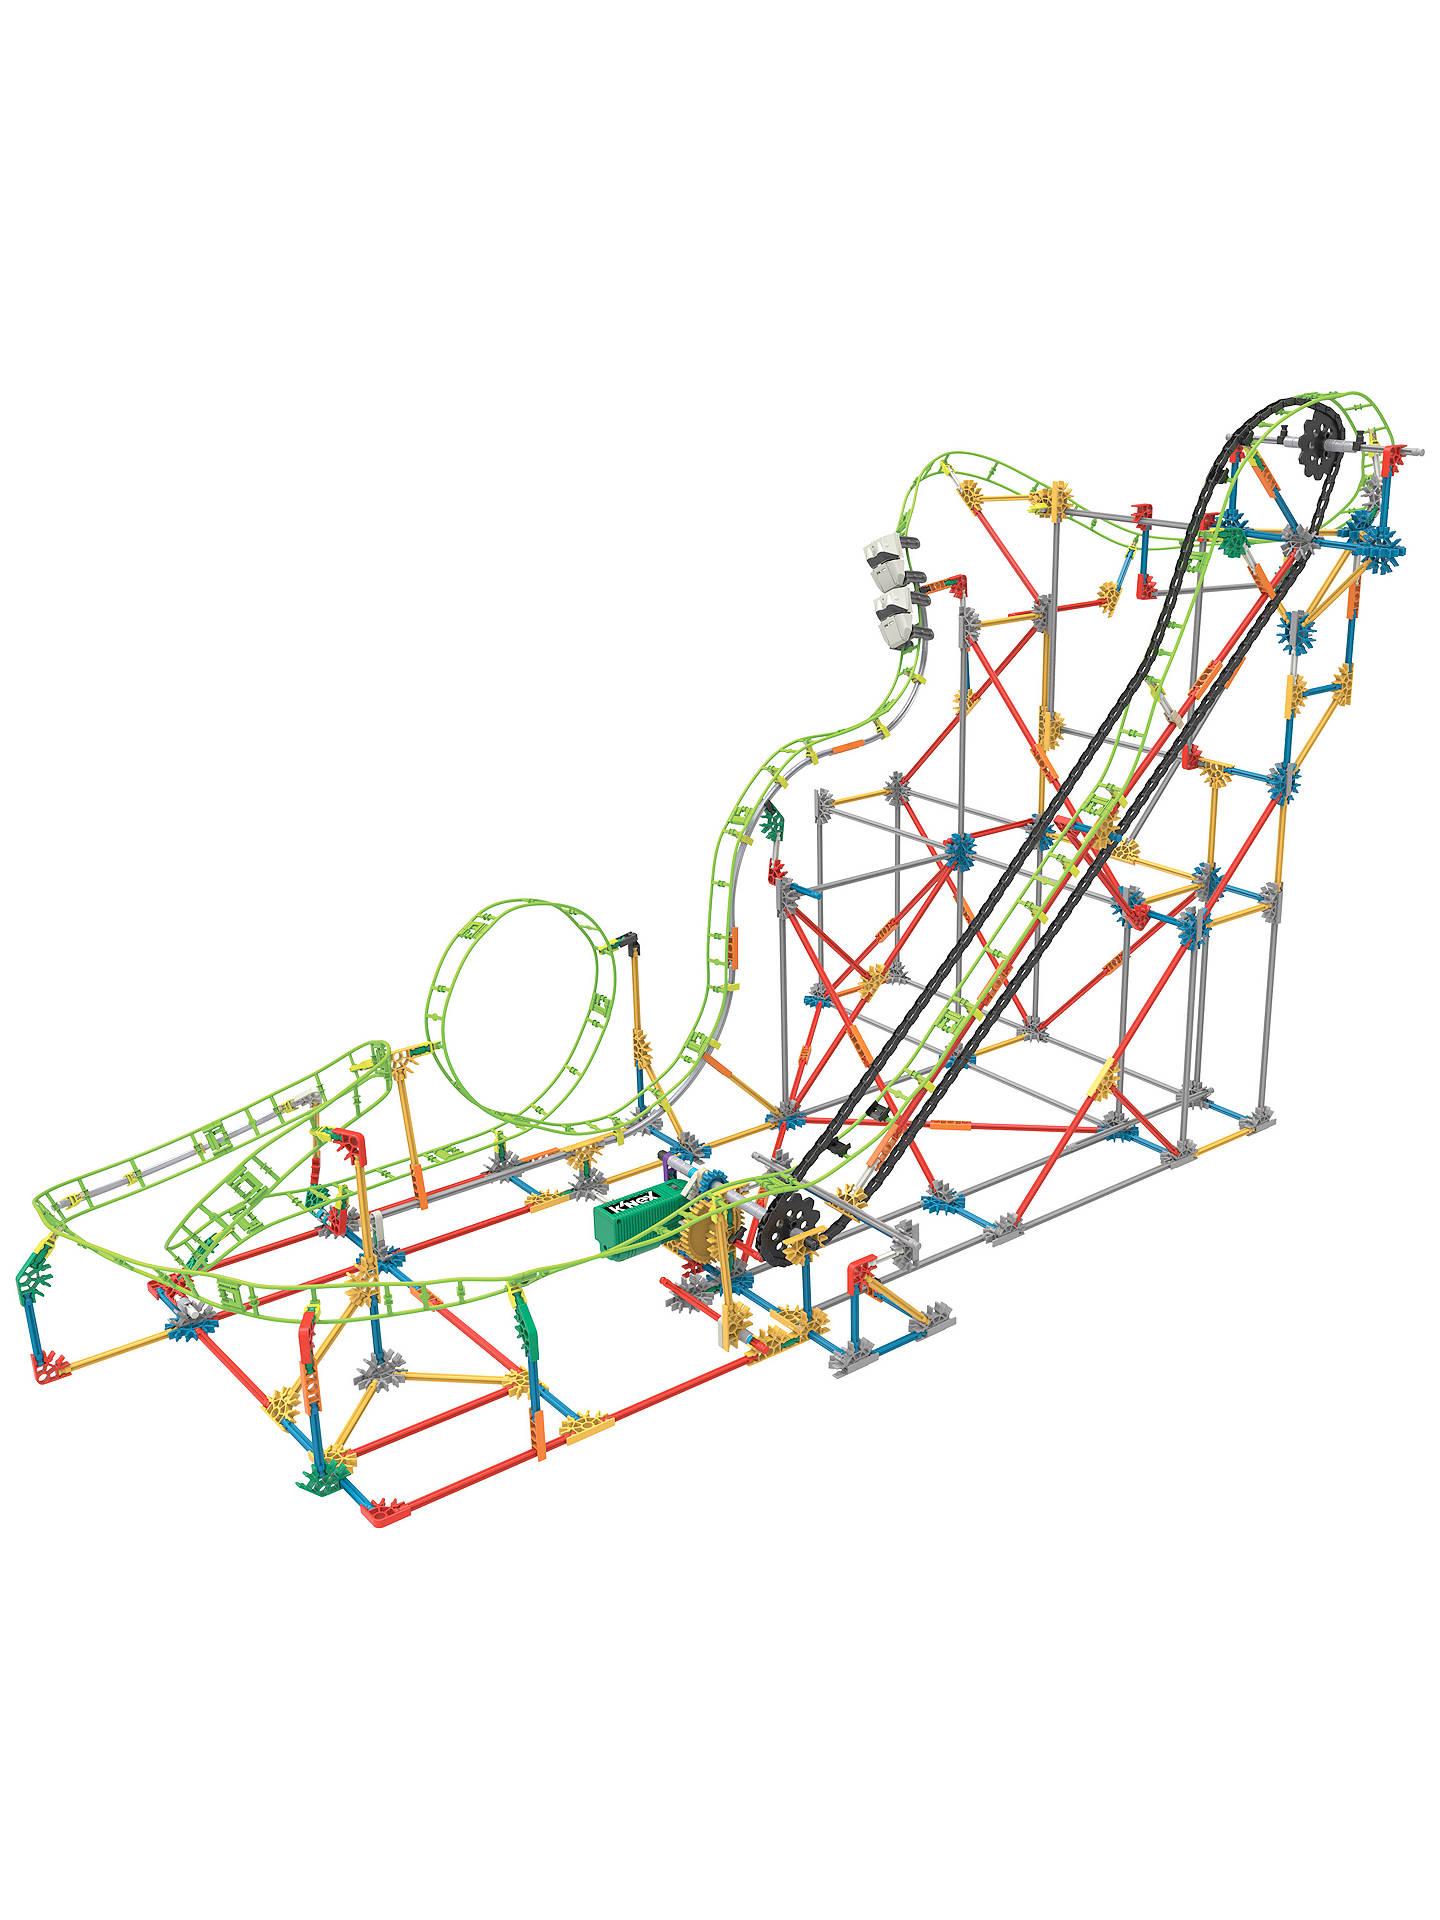 Knex Double Doom Roller Coaster Construction Set 891 Pieces At Velocity Diagram Free Download Wiring Buyknex Online Johnlewis